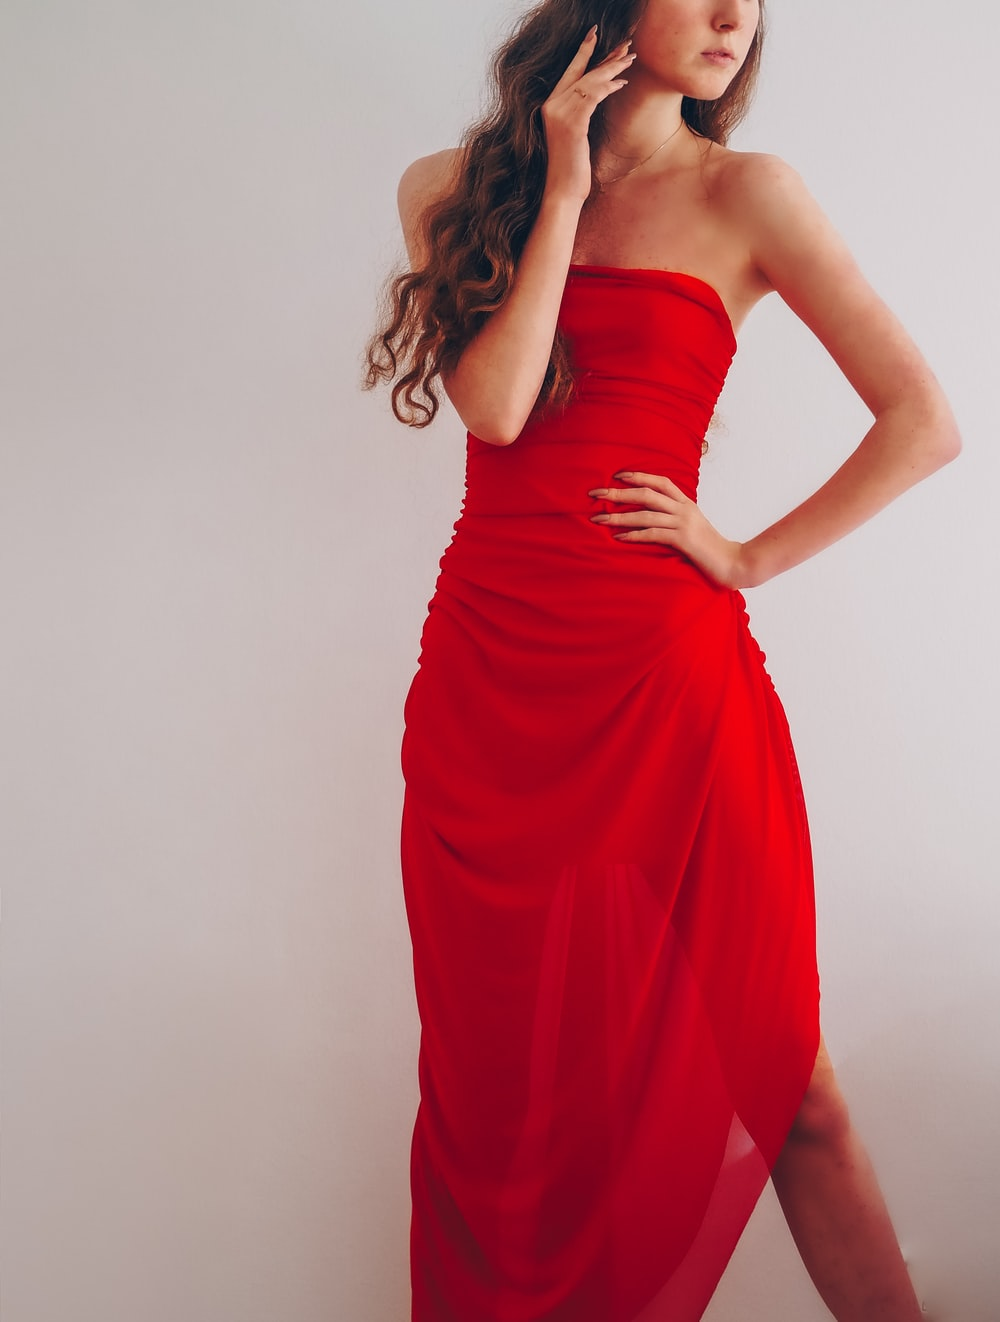 woman in red tube dress photo – Free Paris Image on Unsplash